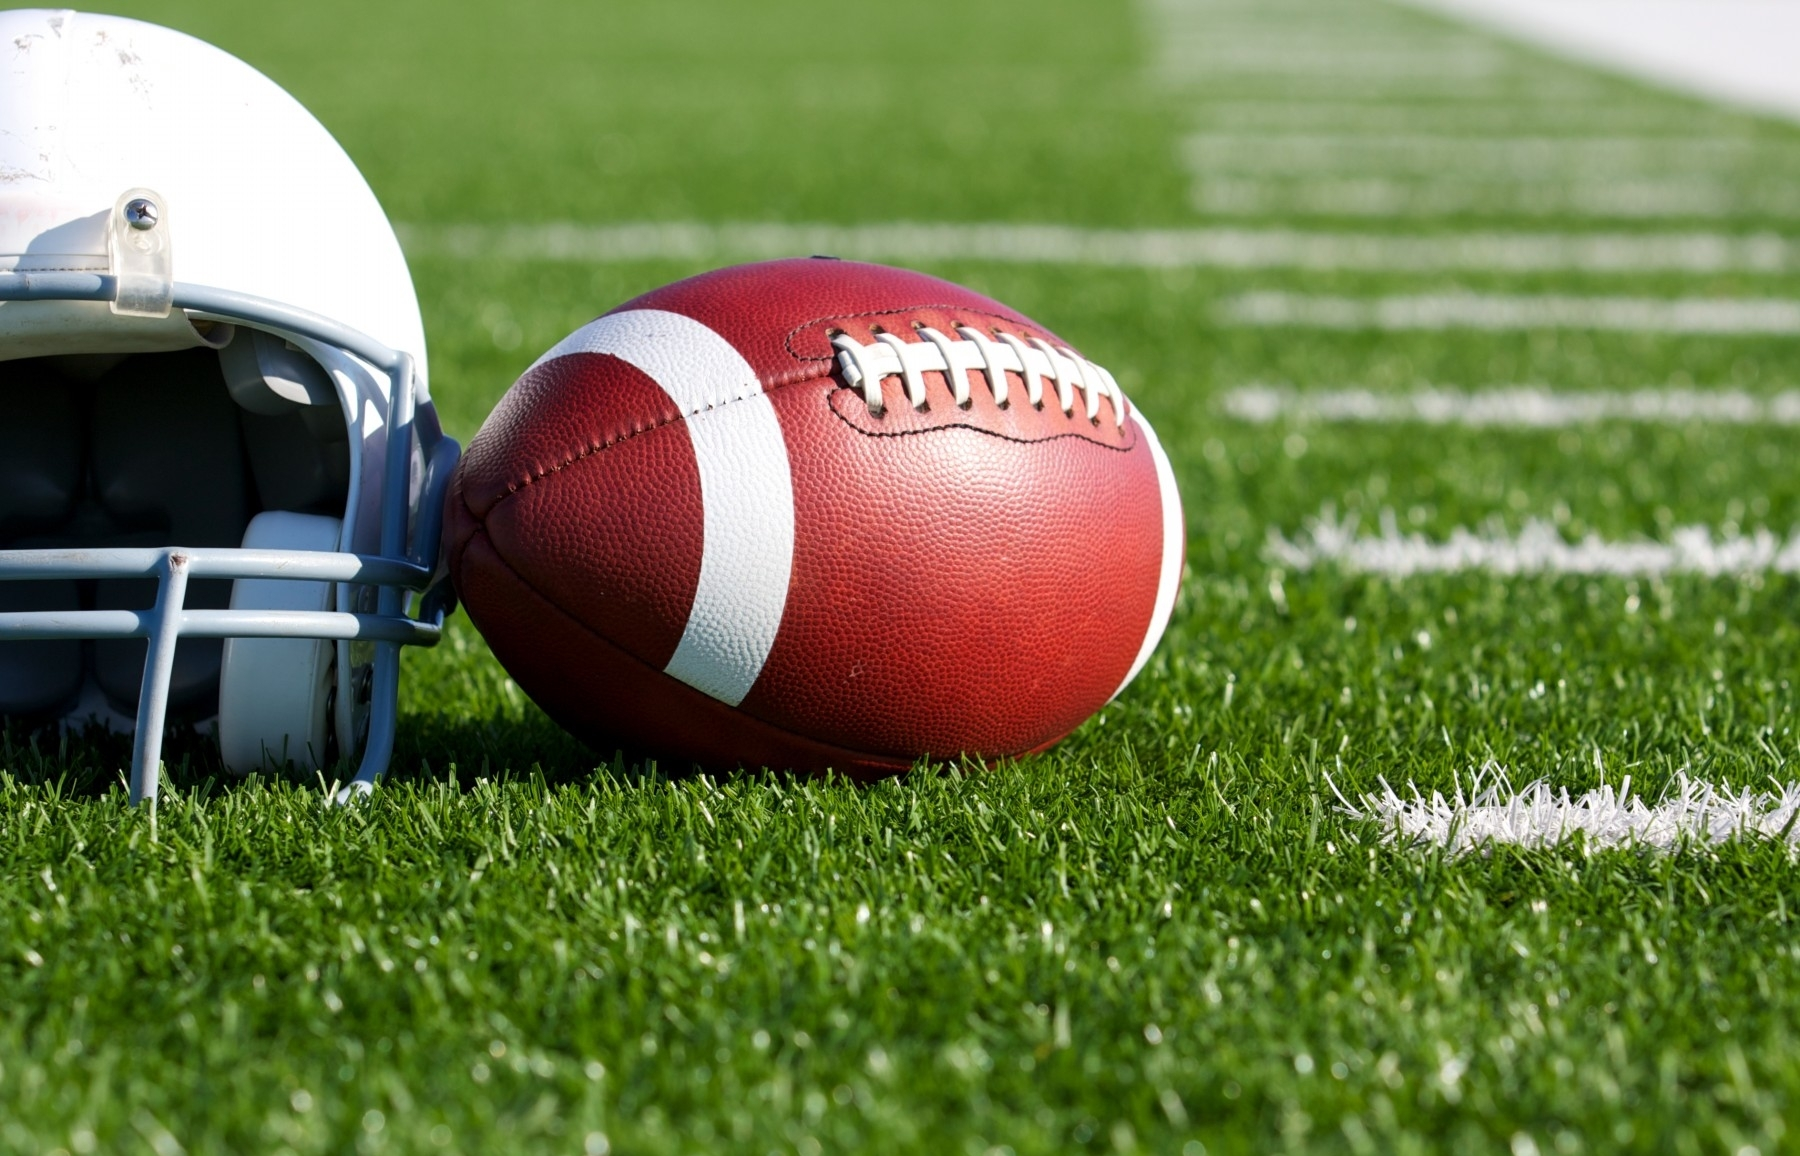 Football-with-Helmet-on-the-Field